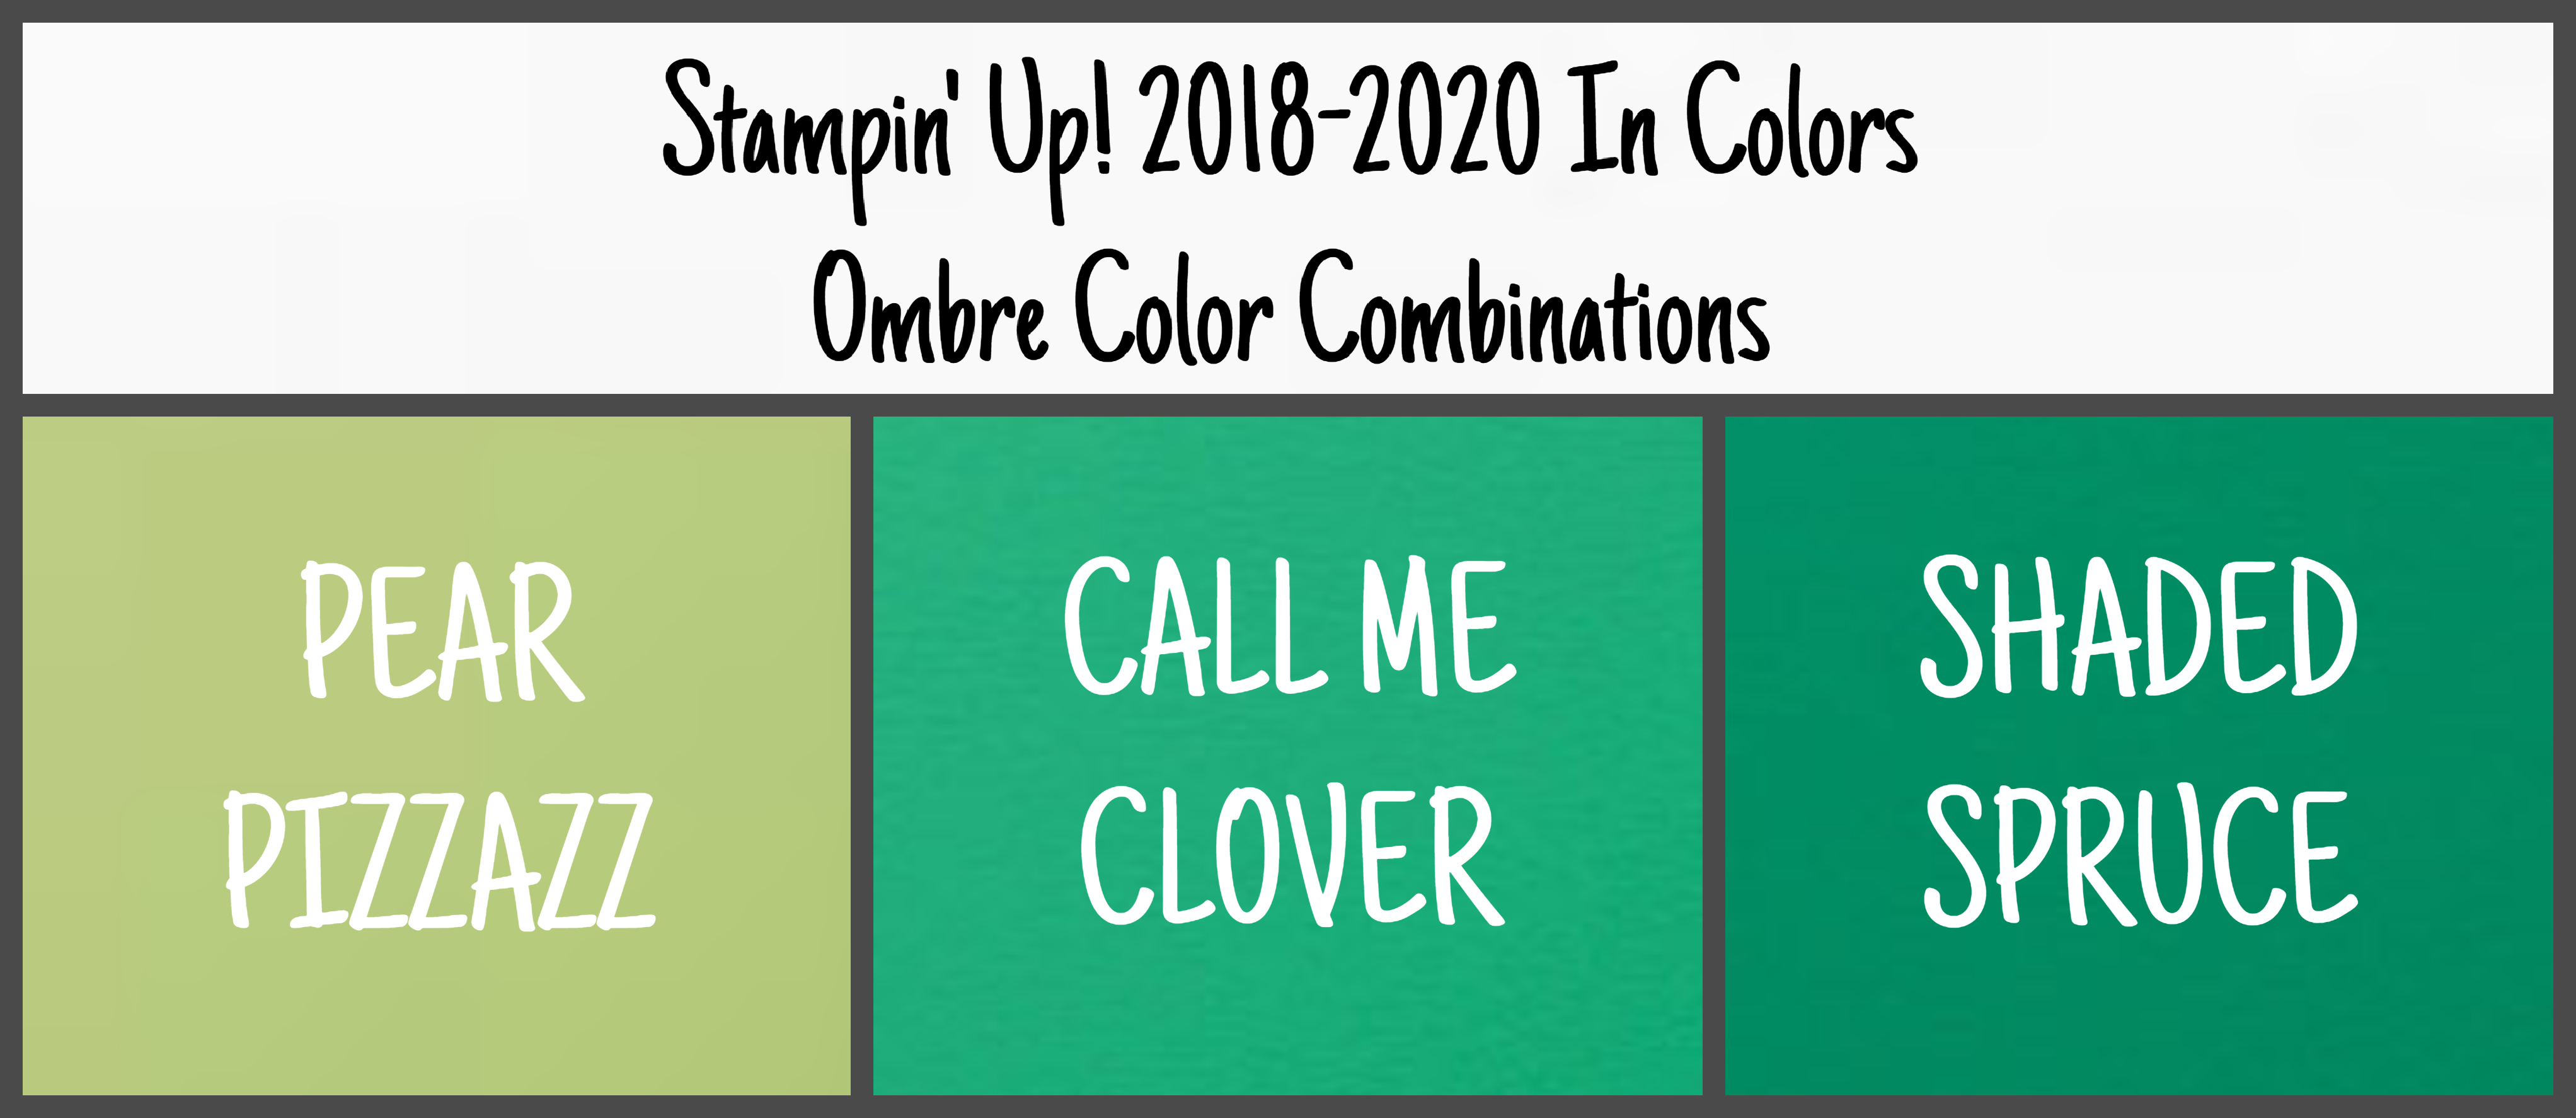 Call Me Clover | kelly kent